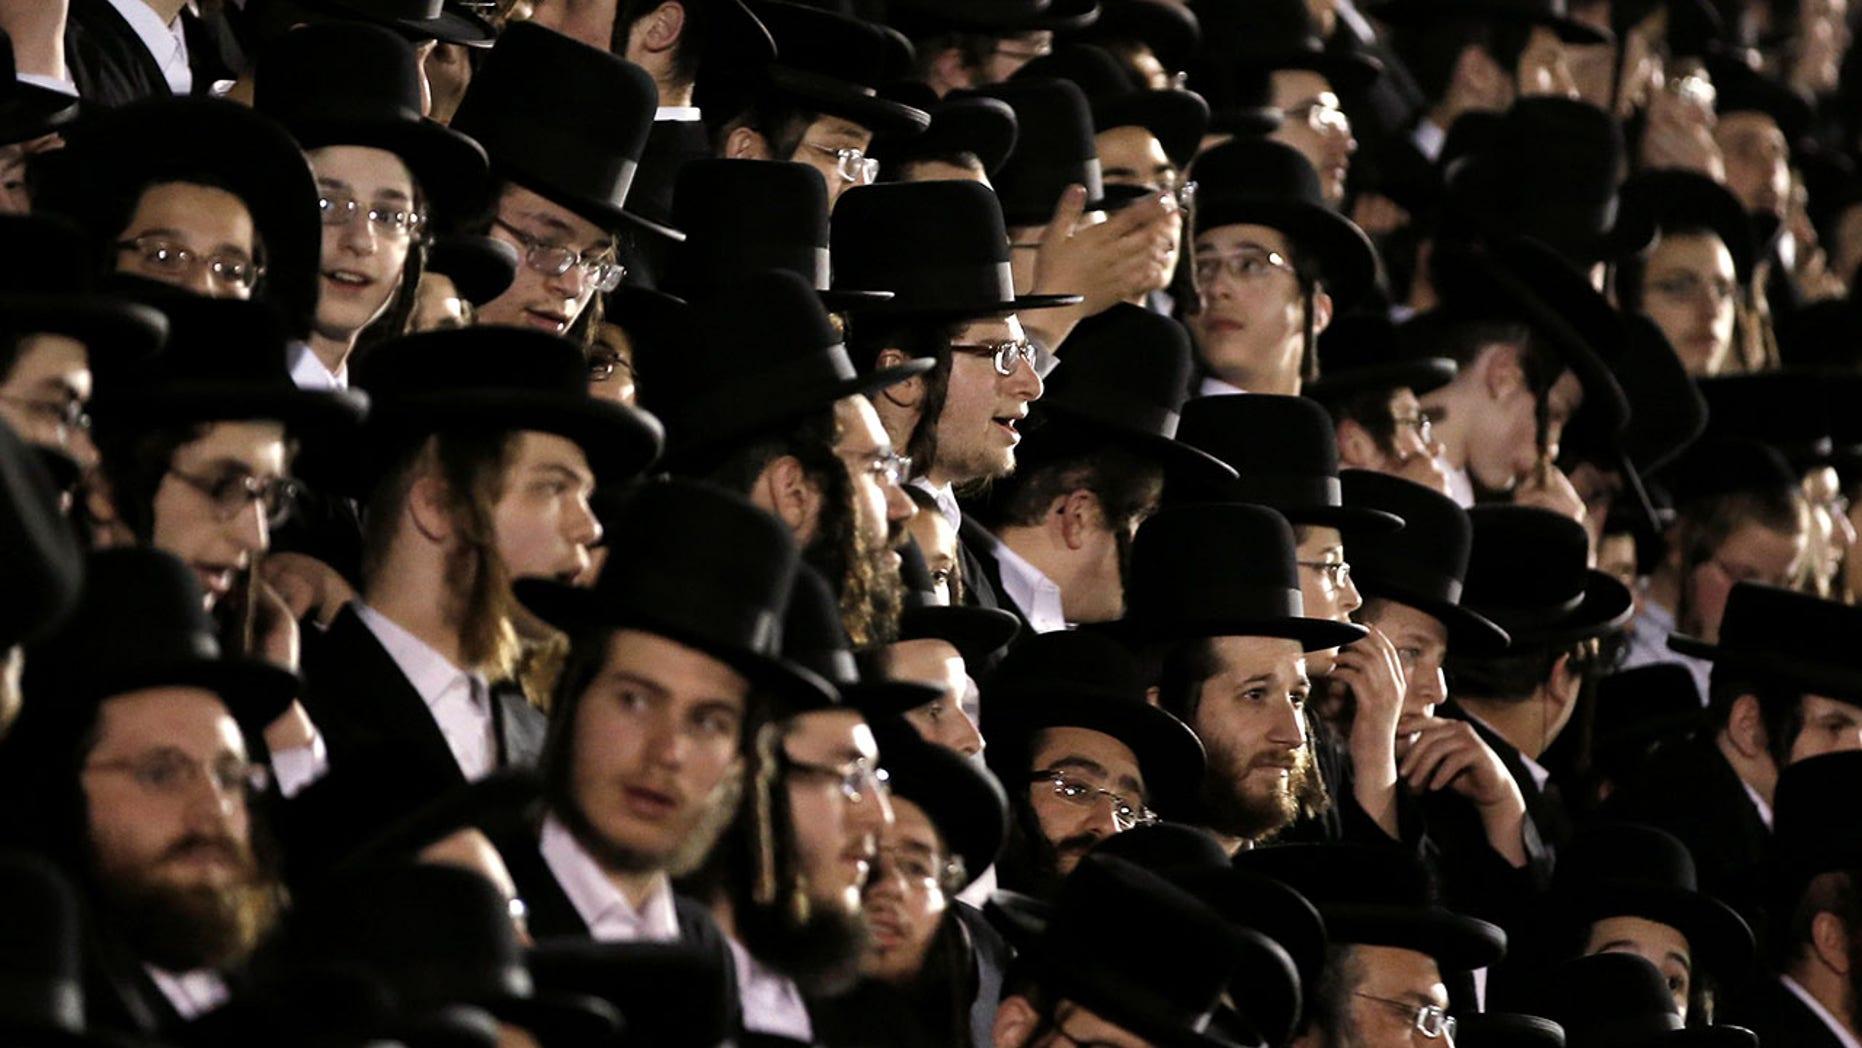 Orthodox Jews of the Satmar Hasidim crowd bleachers near a bonfire in the New York village of Kiryas Joel.